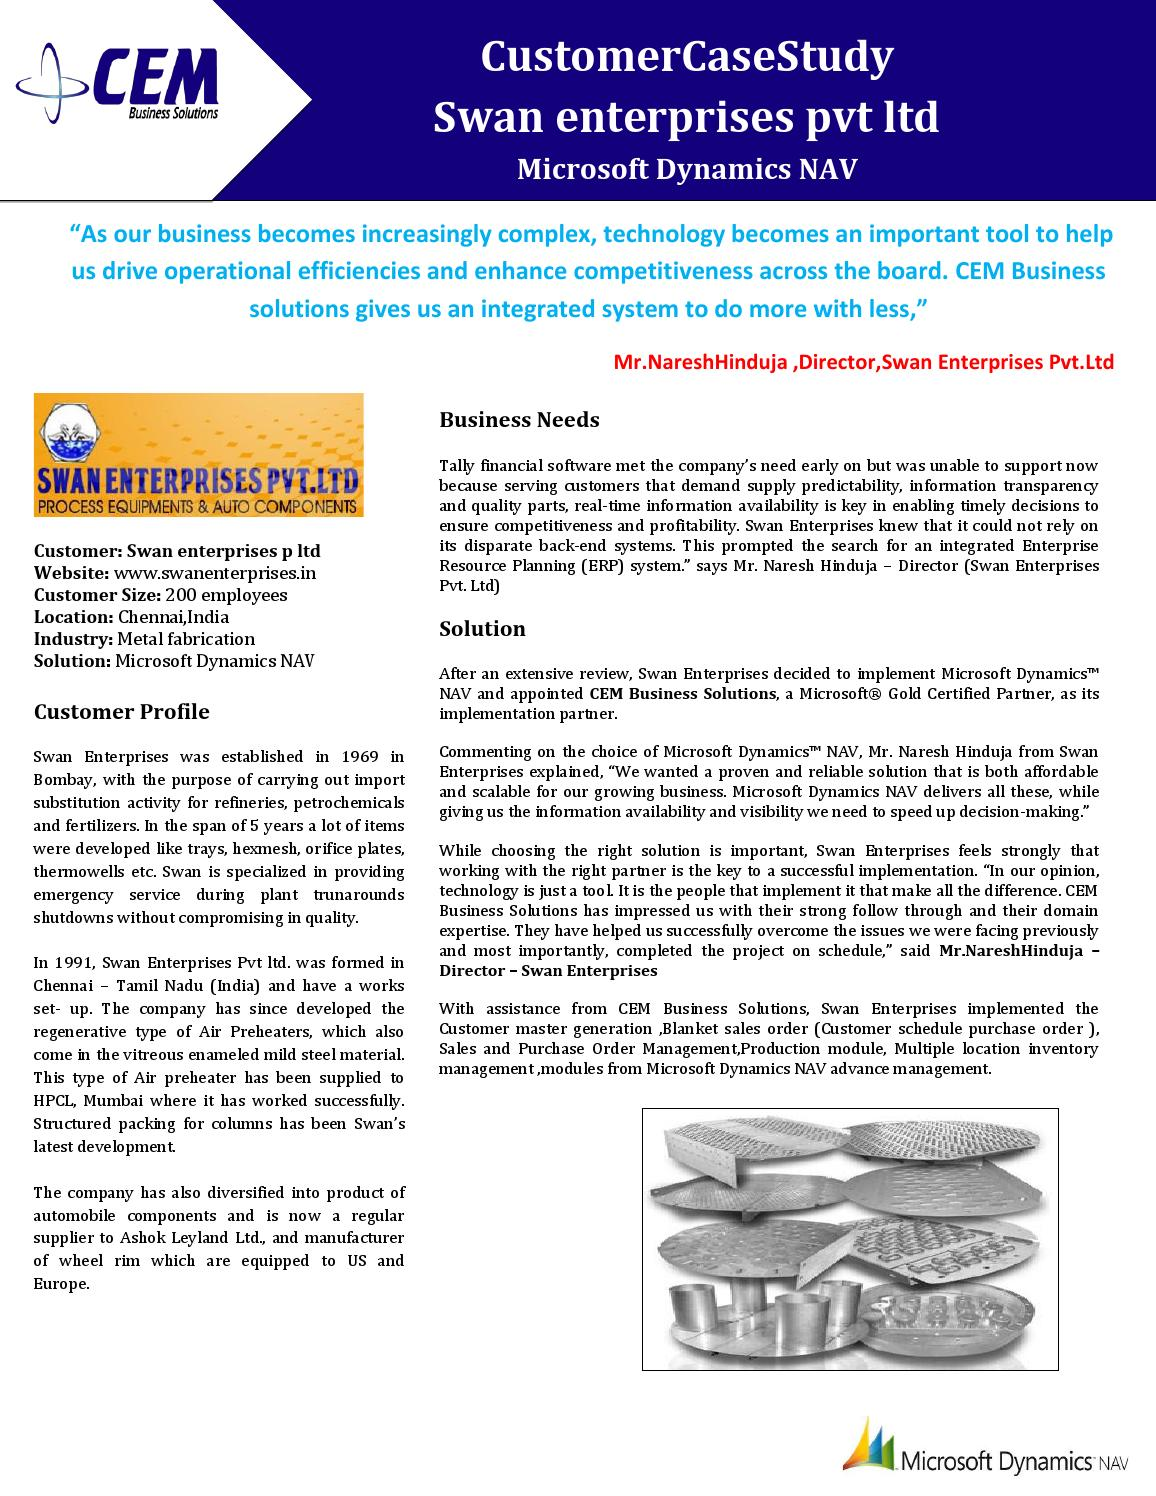 Swan enterprises pvt ltd - Case Study by CEMBS - issuu